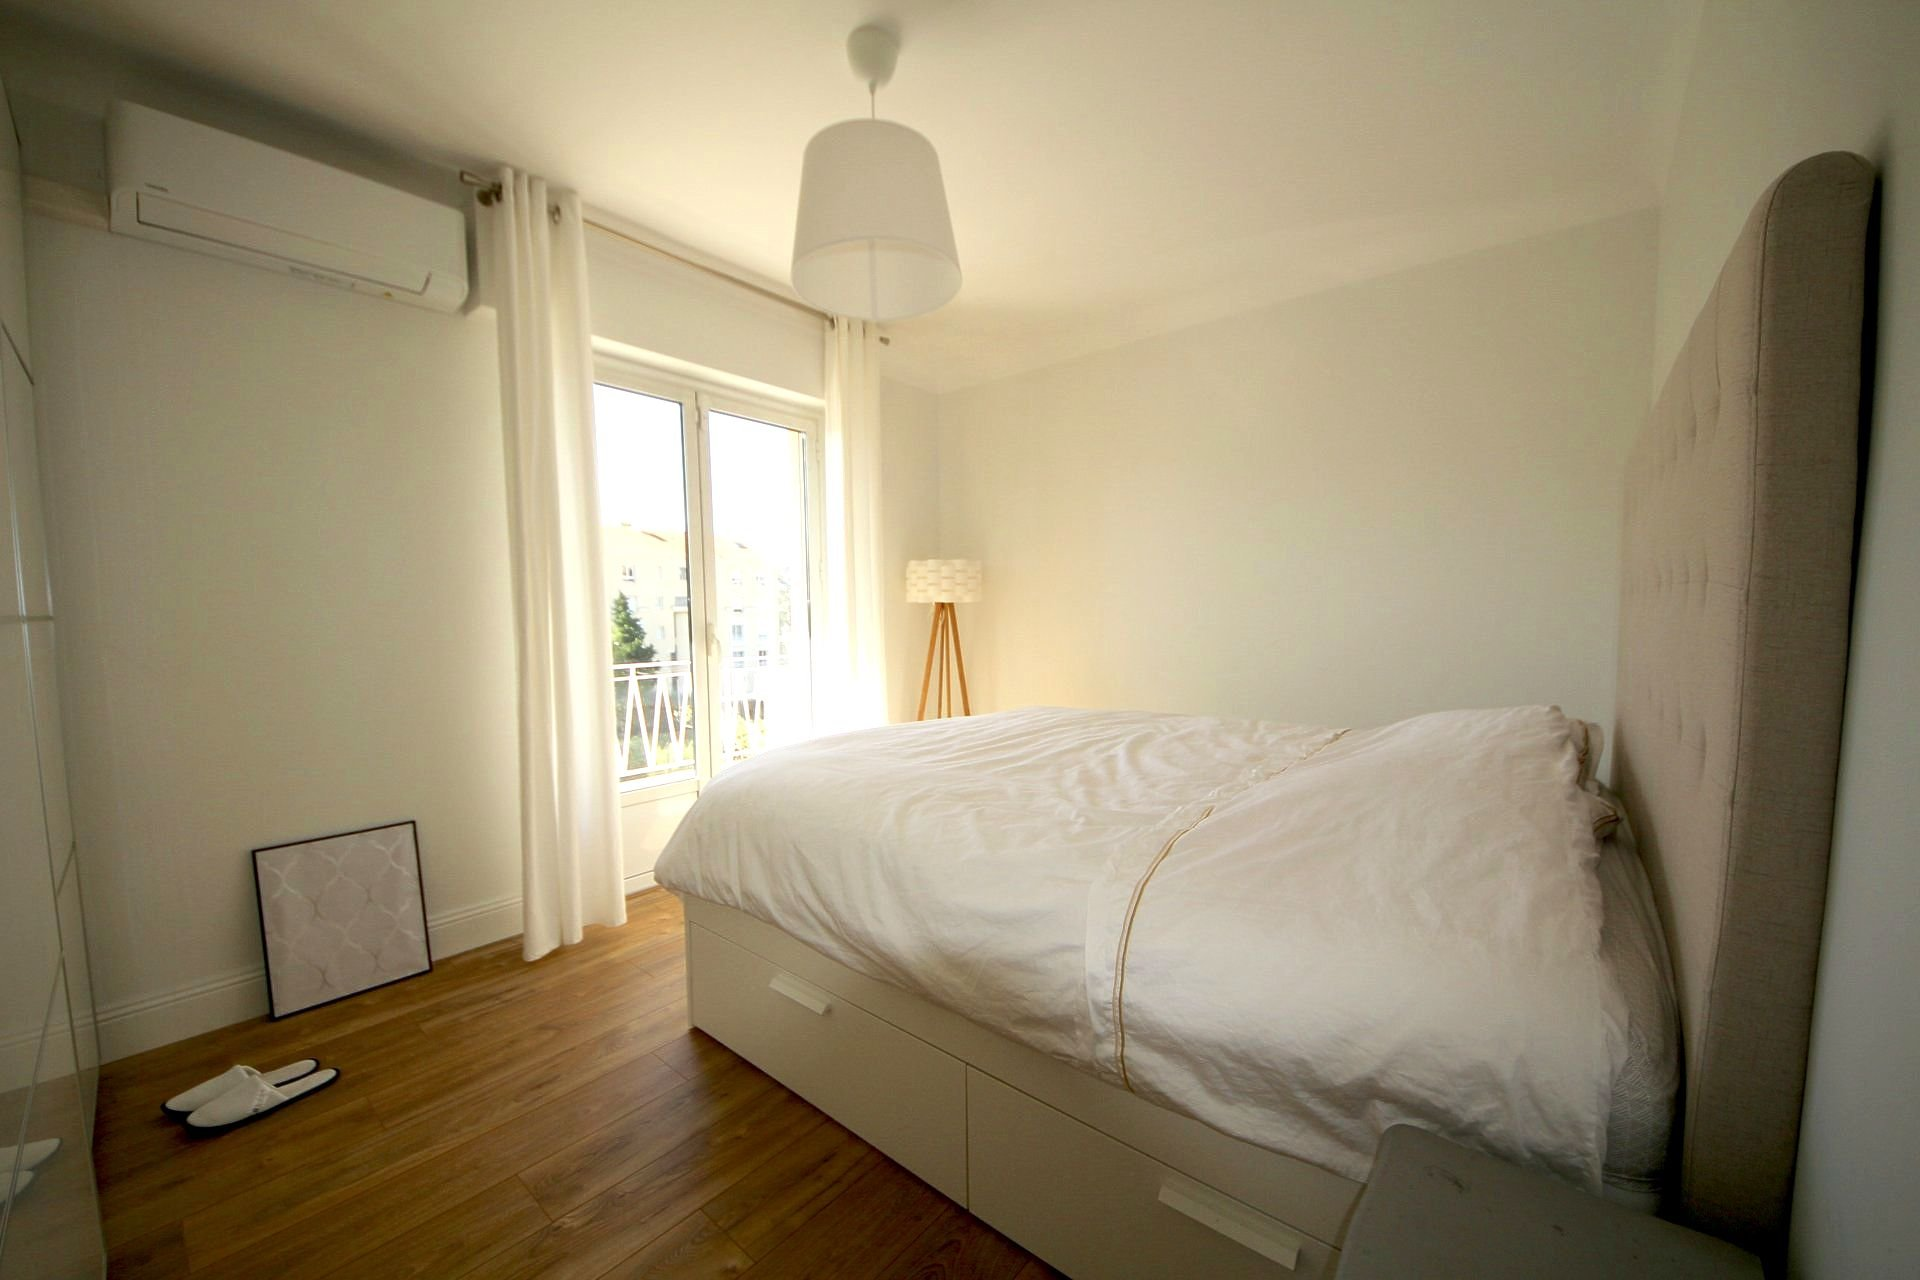 Cannes Basses Californie, beautiful  last floor 2 bedrooms apartment 70sqm and 28sqm terraces